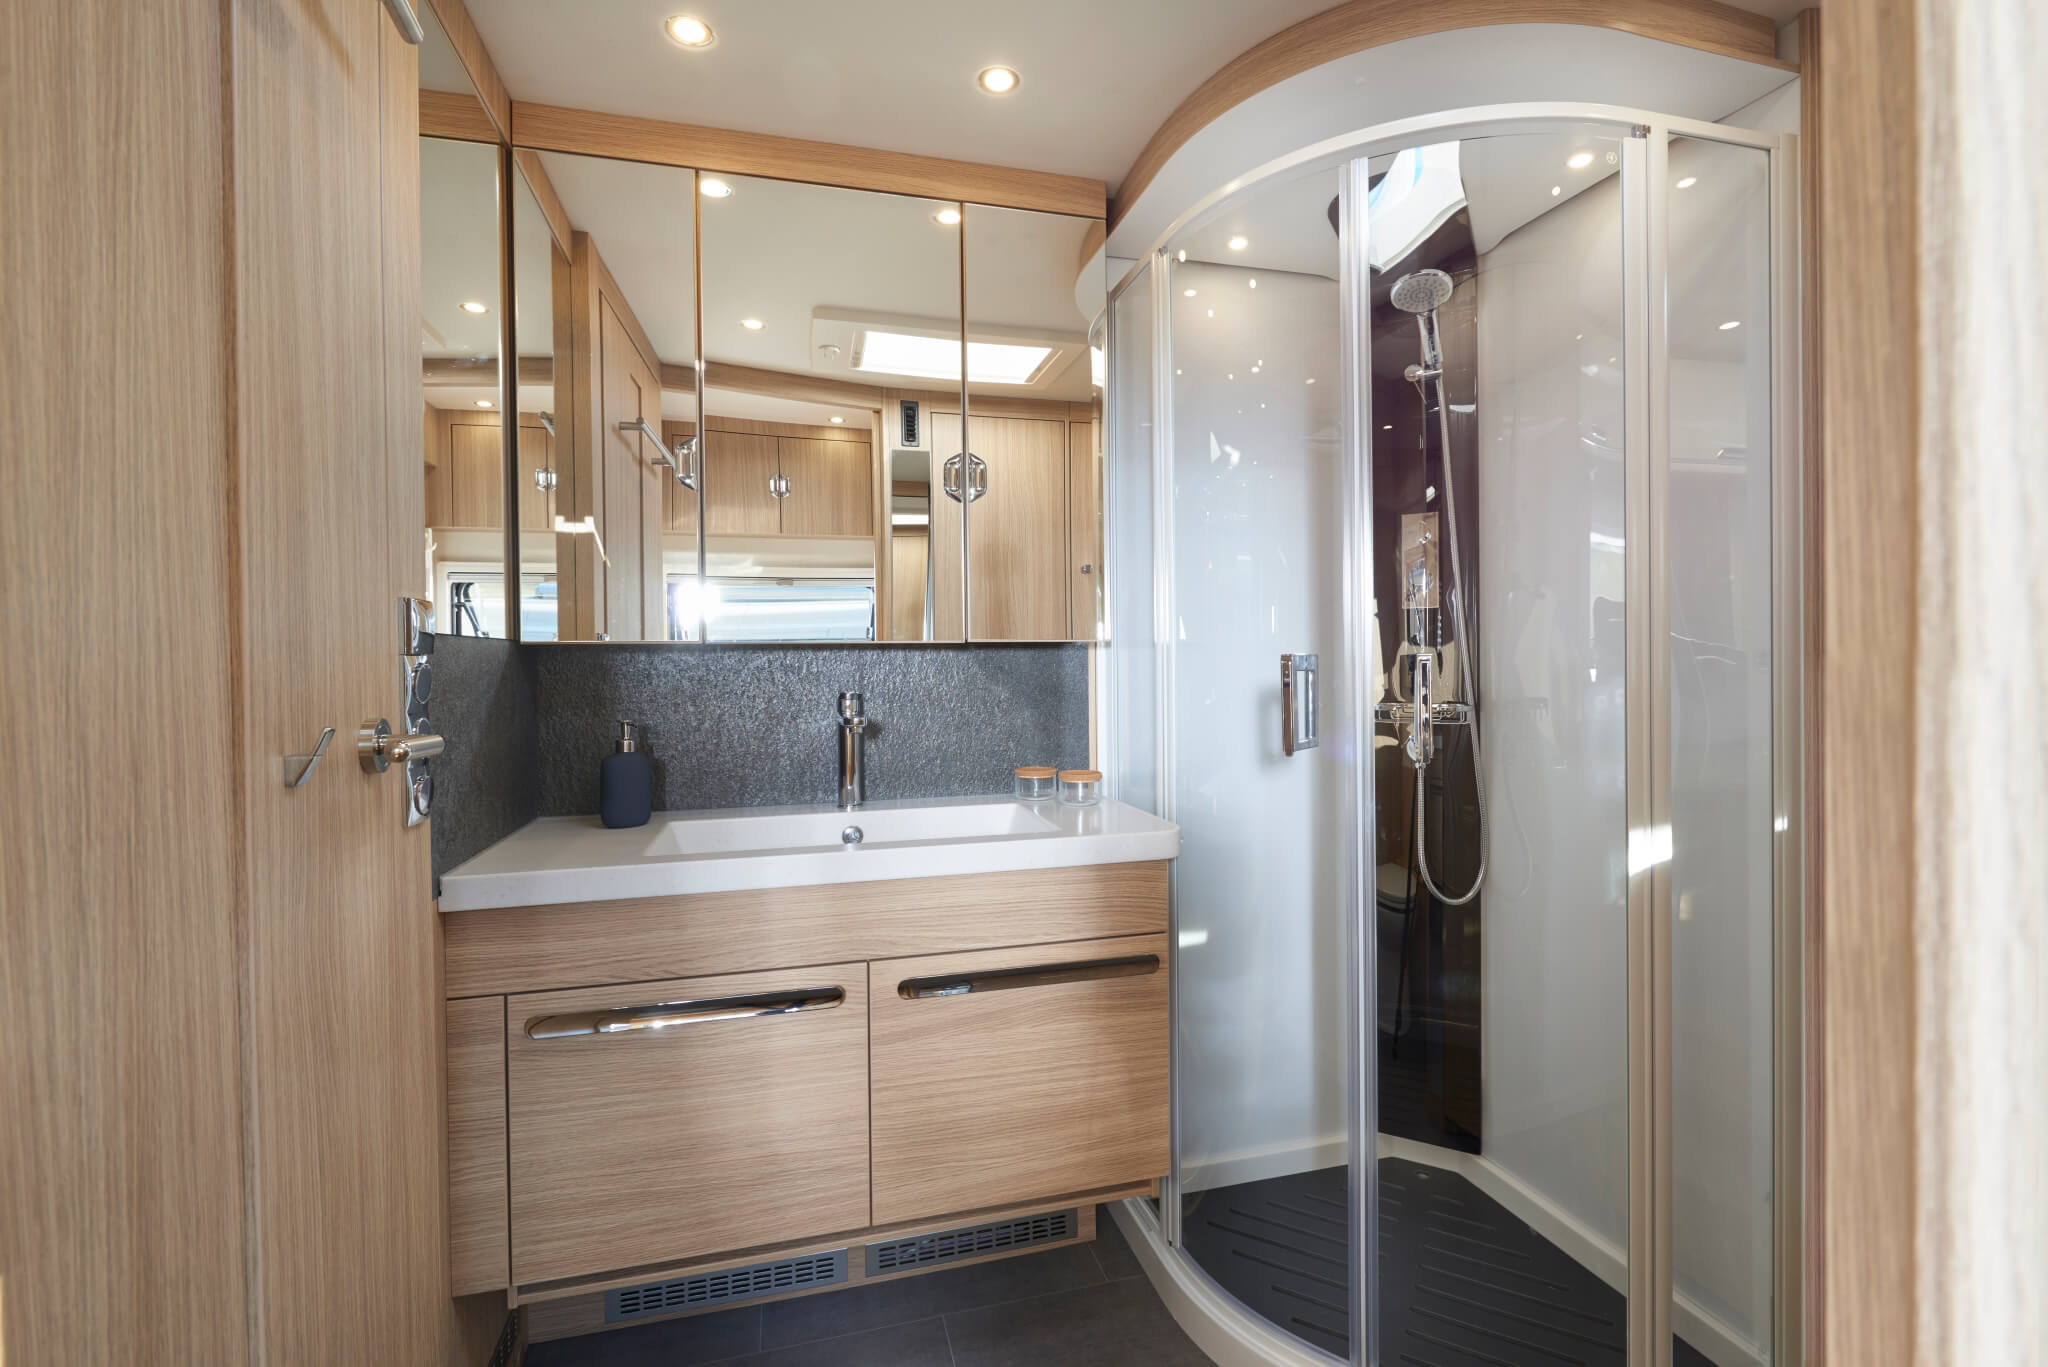 NIESMANN+BISCHOFF - Flair 920 LW - Salle de bain spacieuse XXL